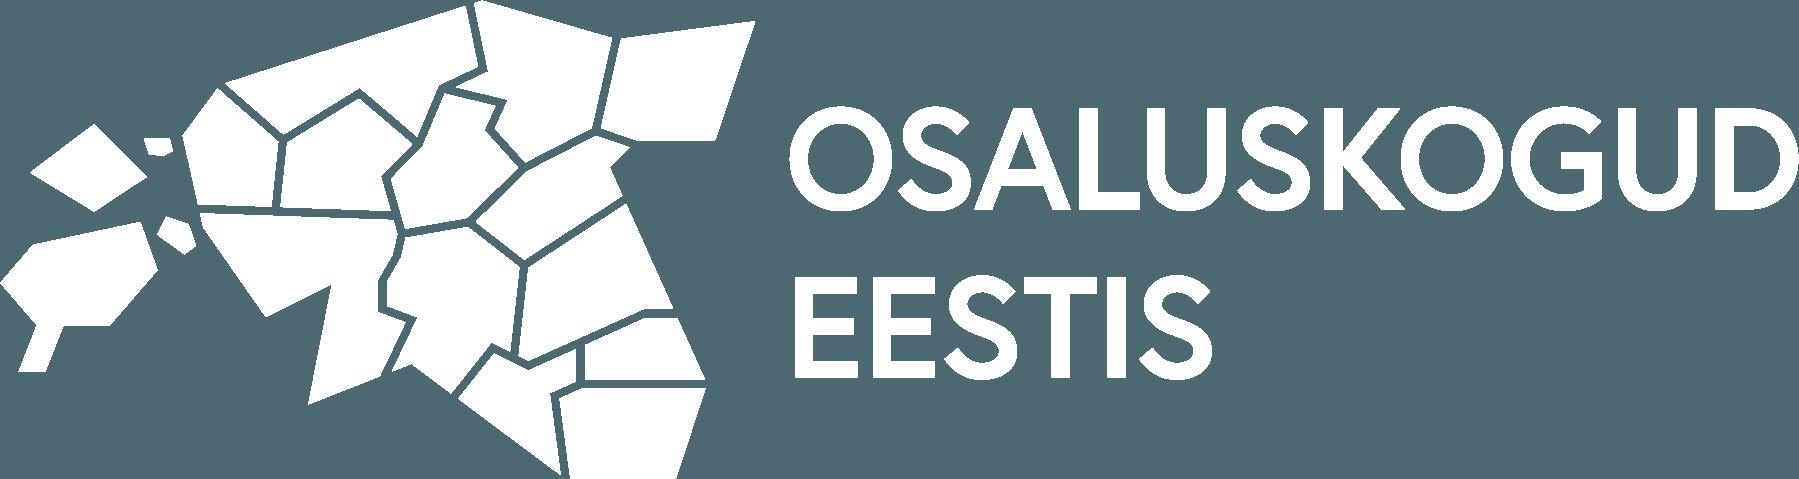 Osaluskogud logo